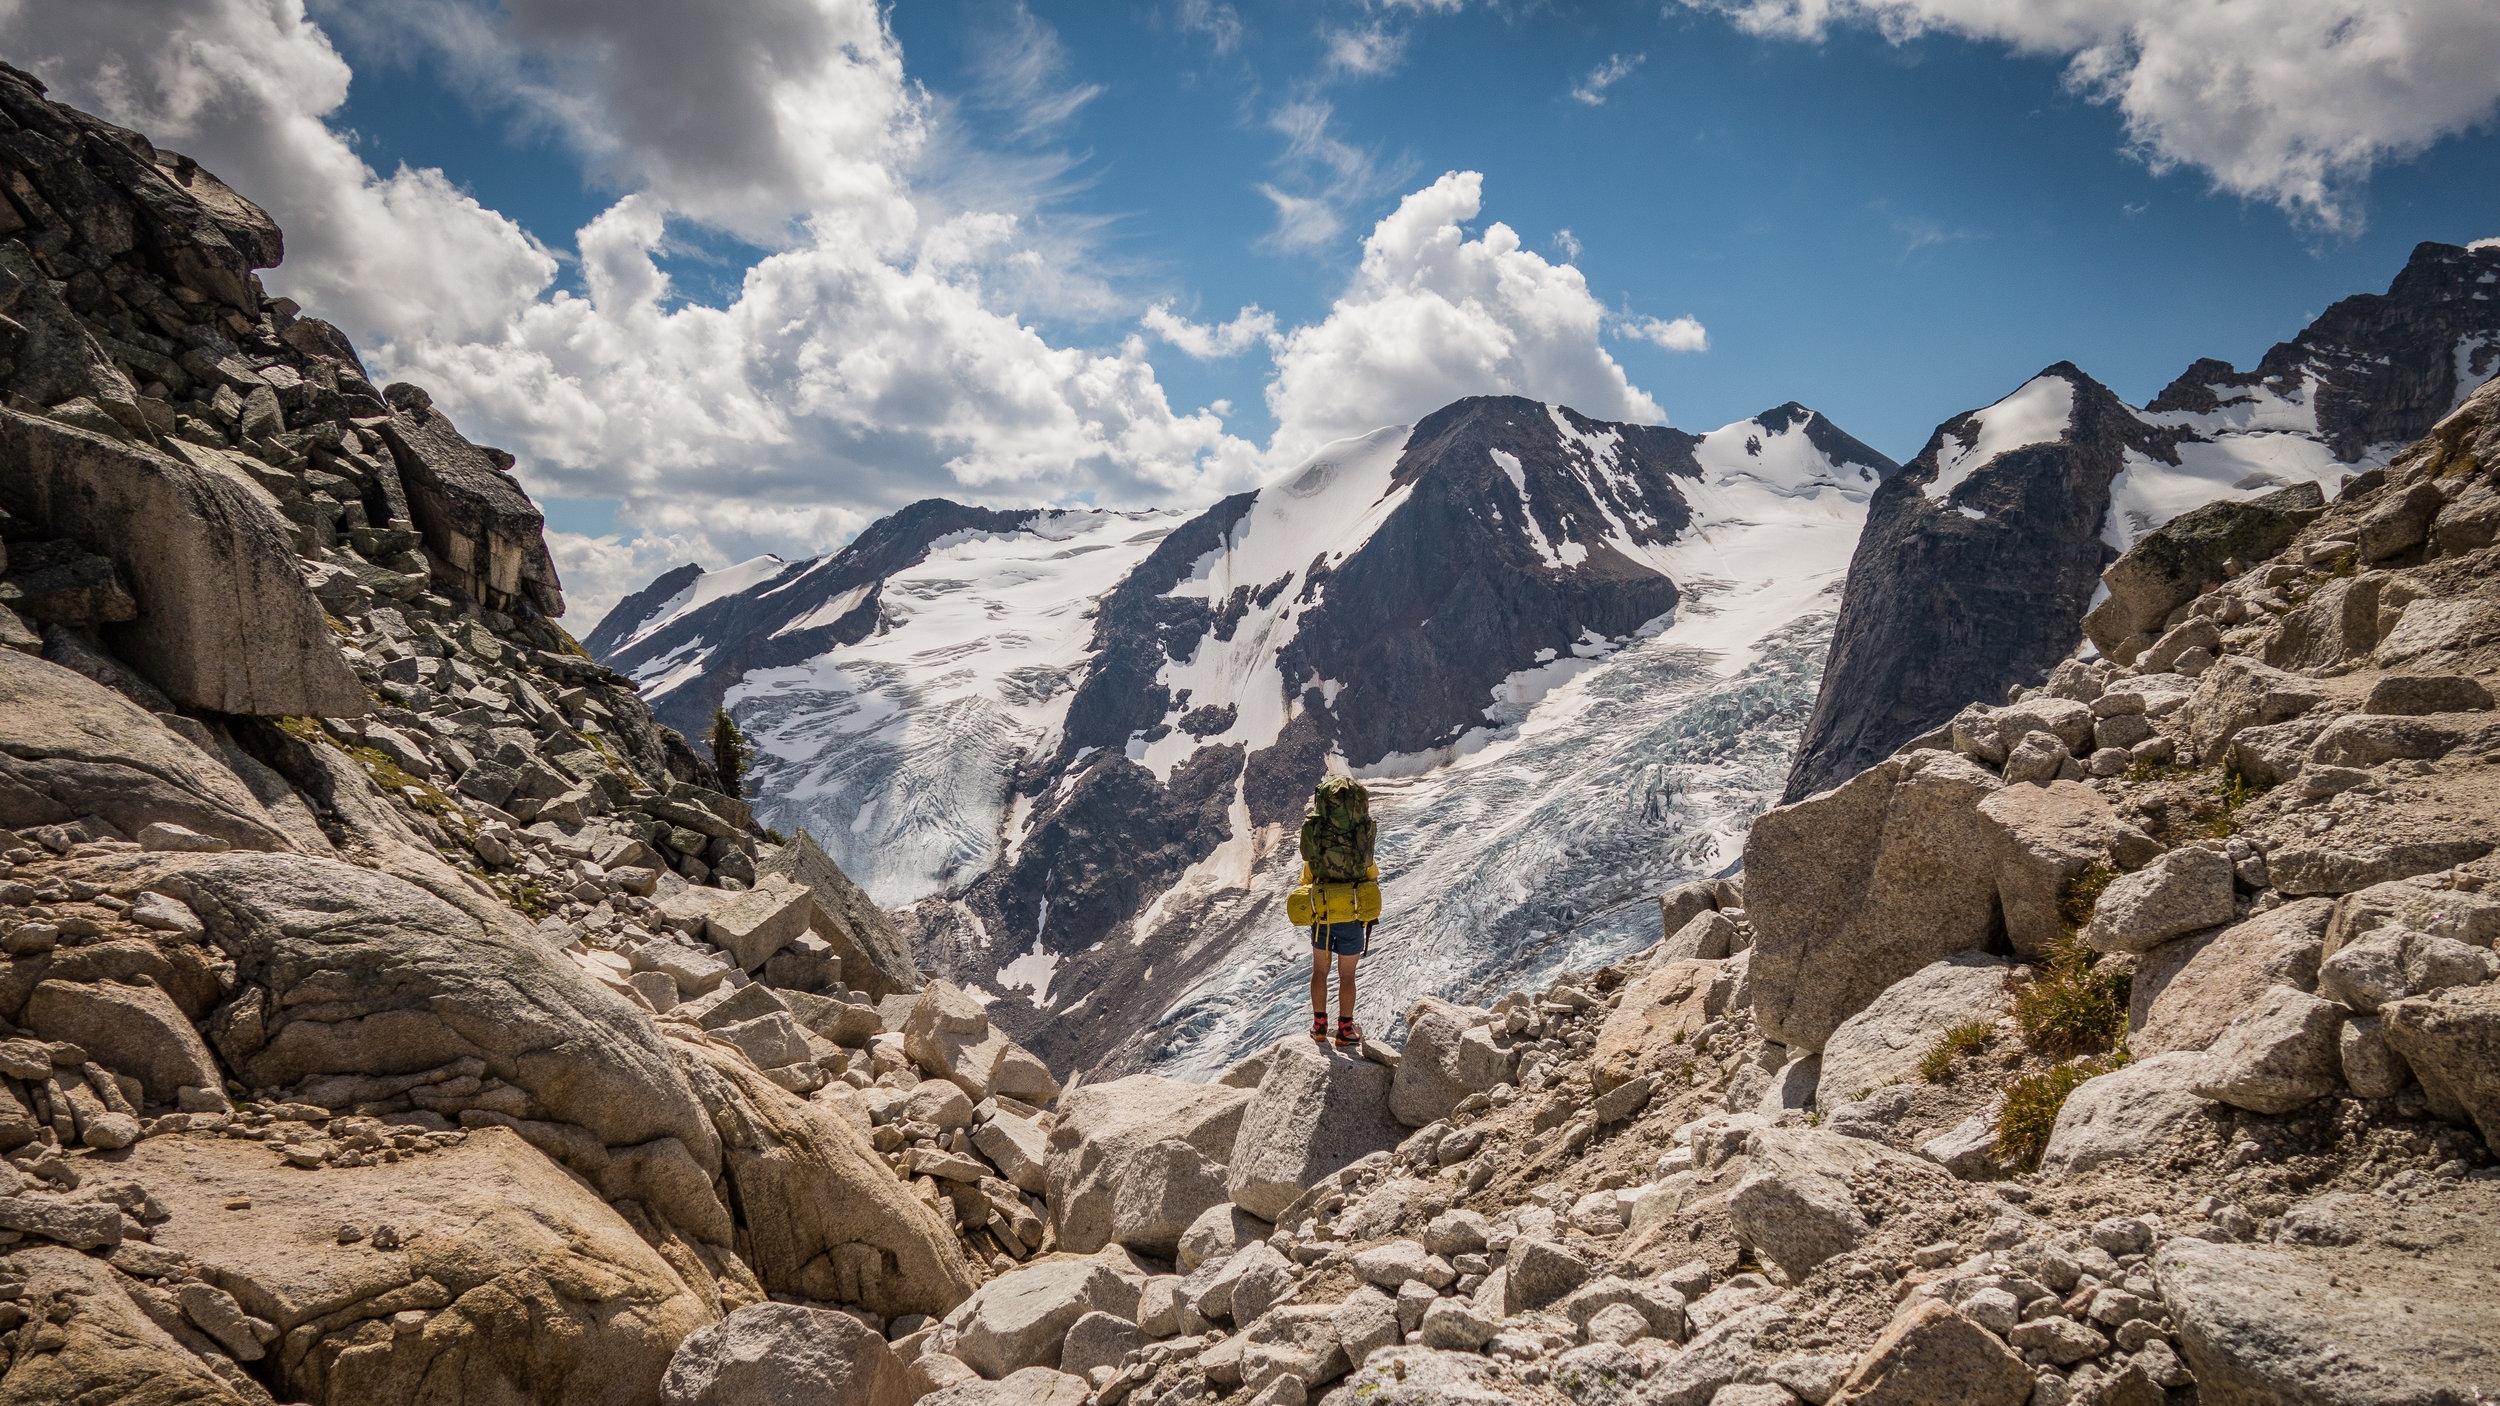 Blog - inspiration and adventure